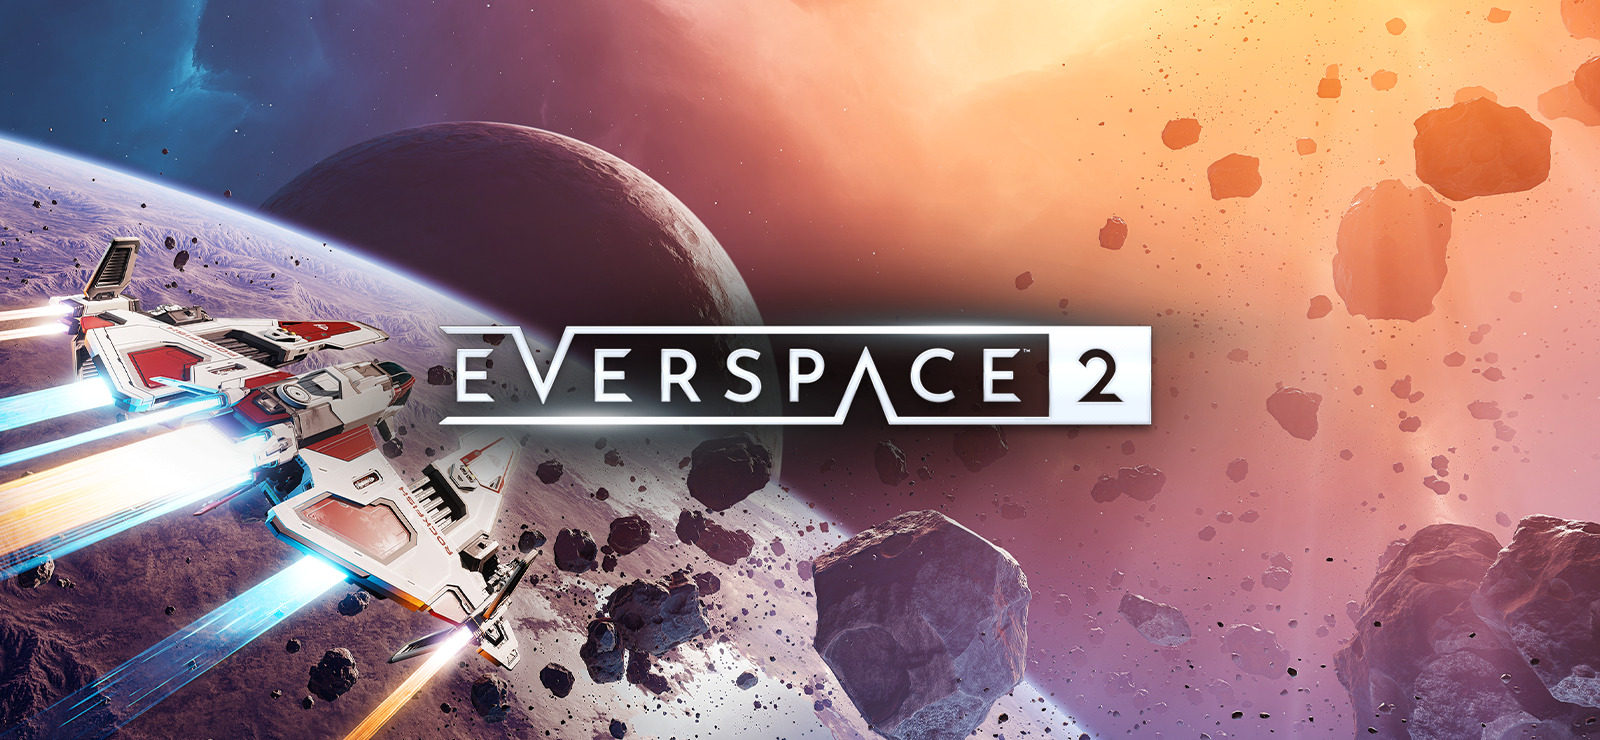 Download Everspace 2 v0.4.16428-GOG in PC [ Torrent ]